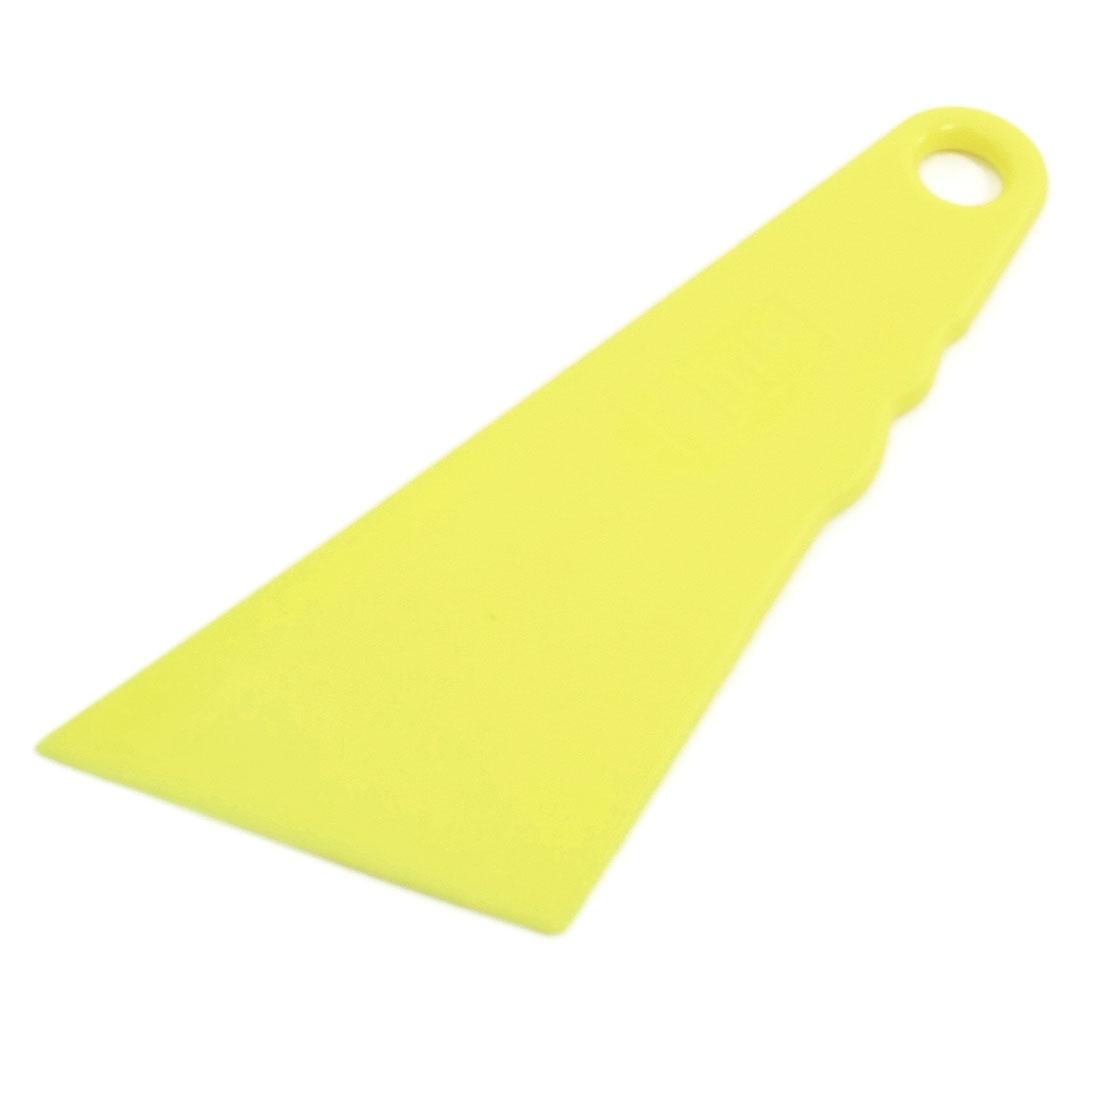 Car Yellow Plastic Triangle Design Window Glass Mirror Scraper Blade Cleaning